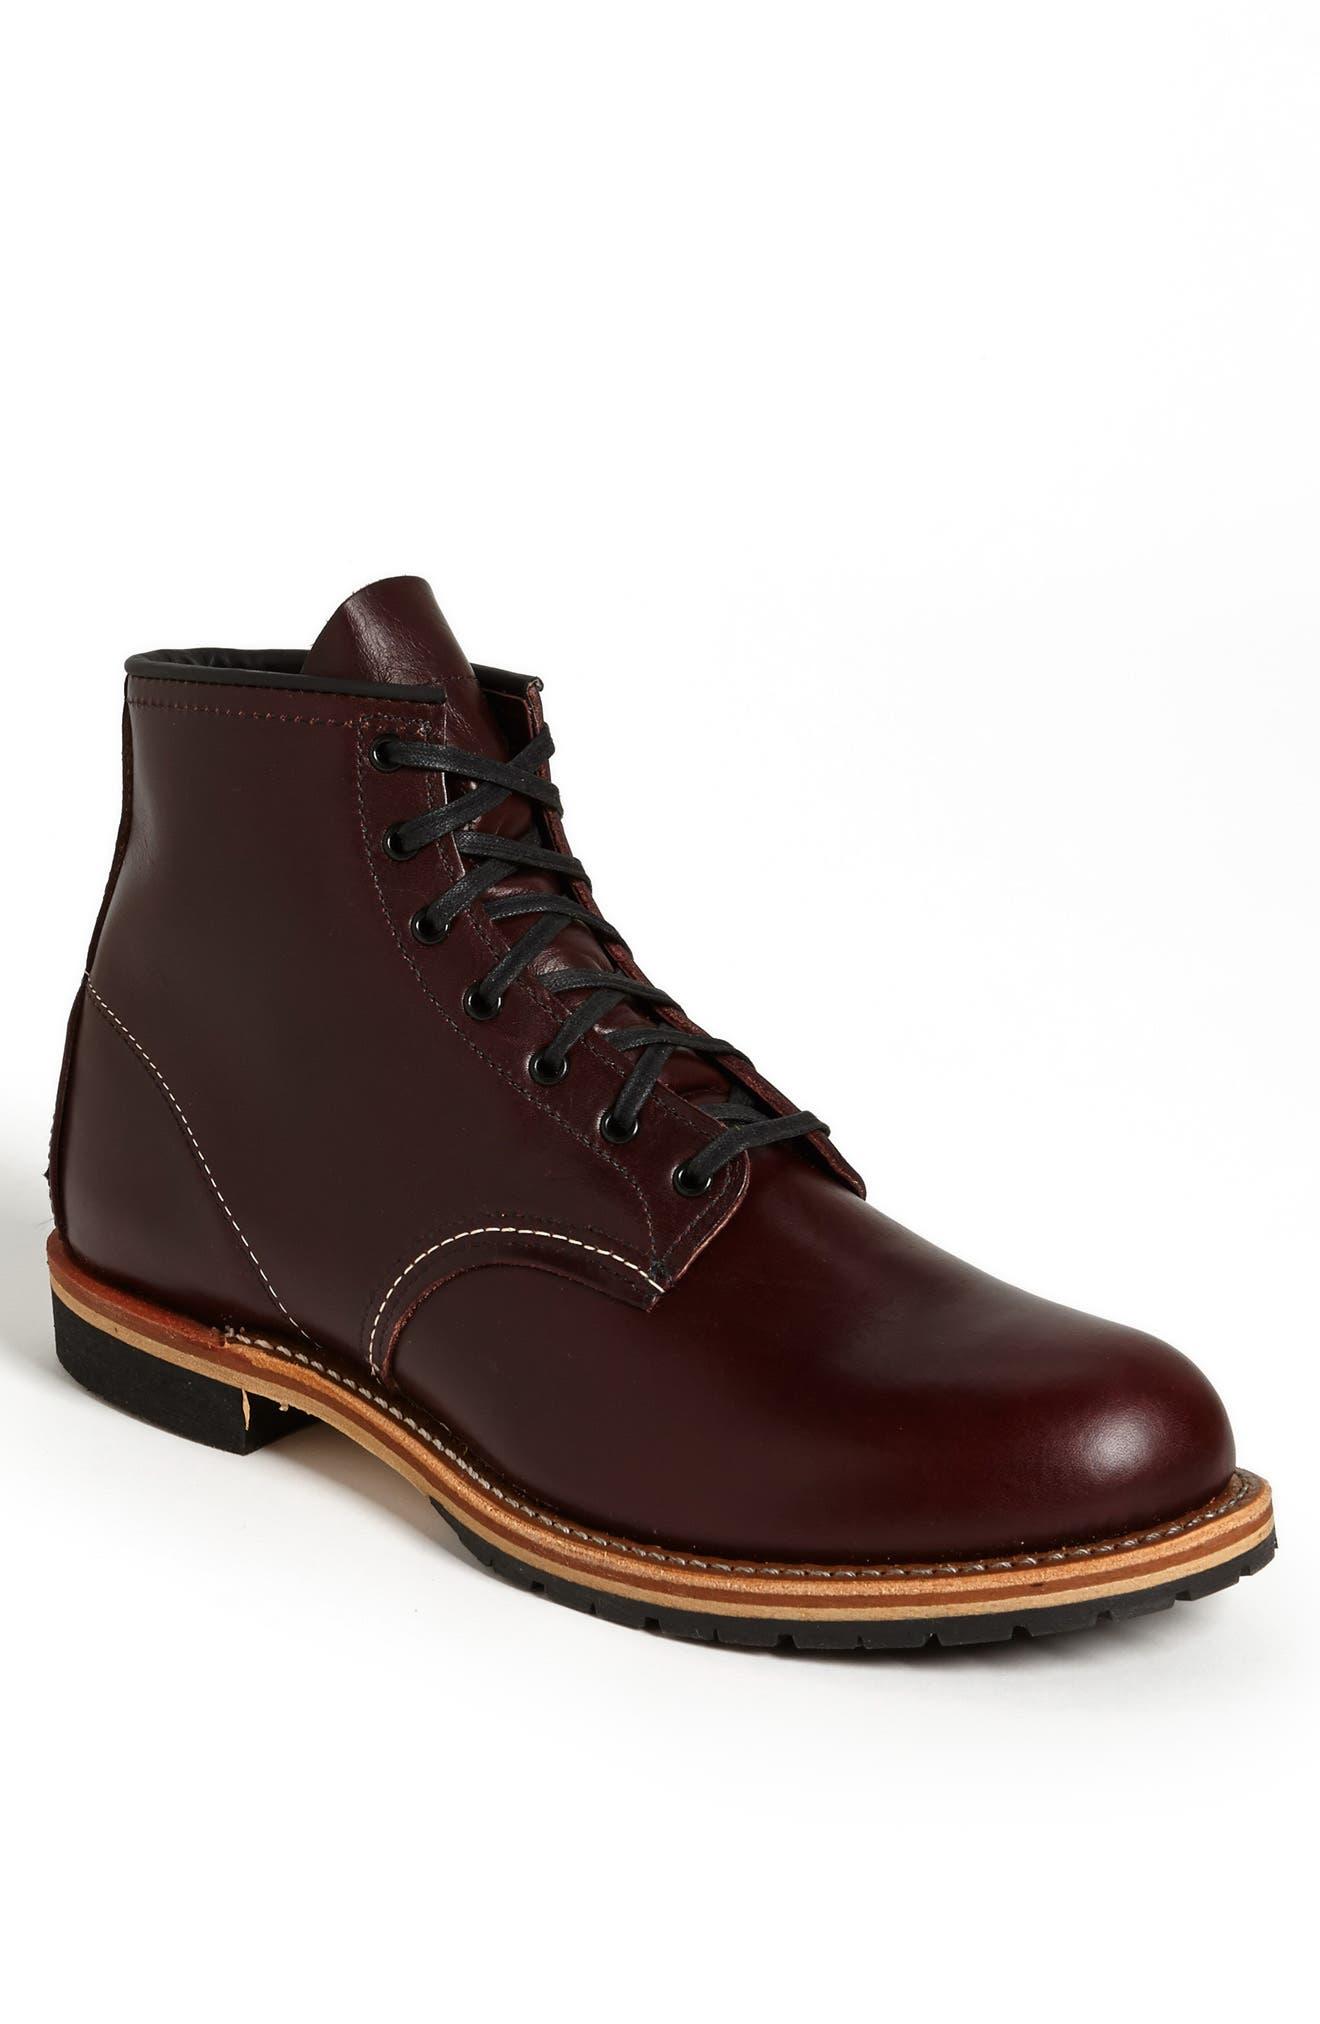 'Beckman' Boot,                         Main,                         color, 002